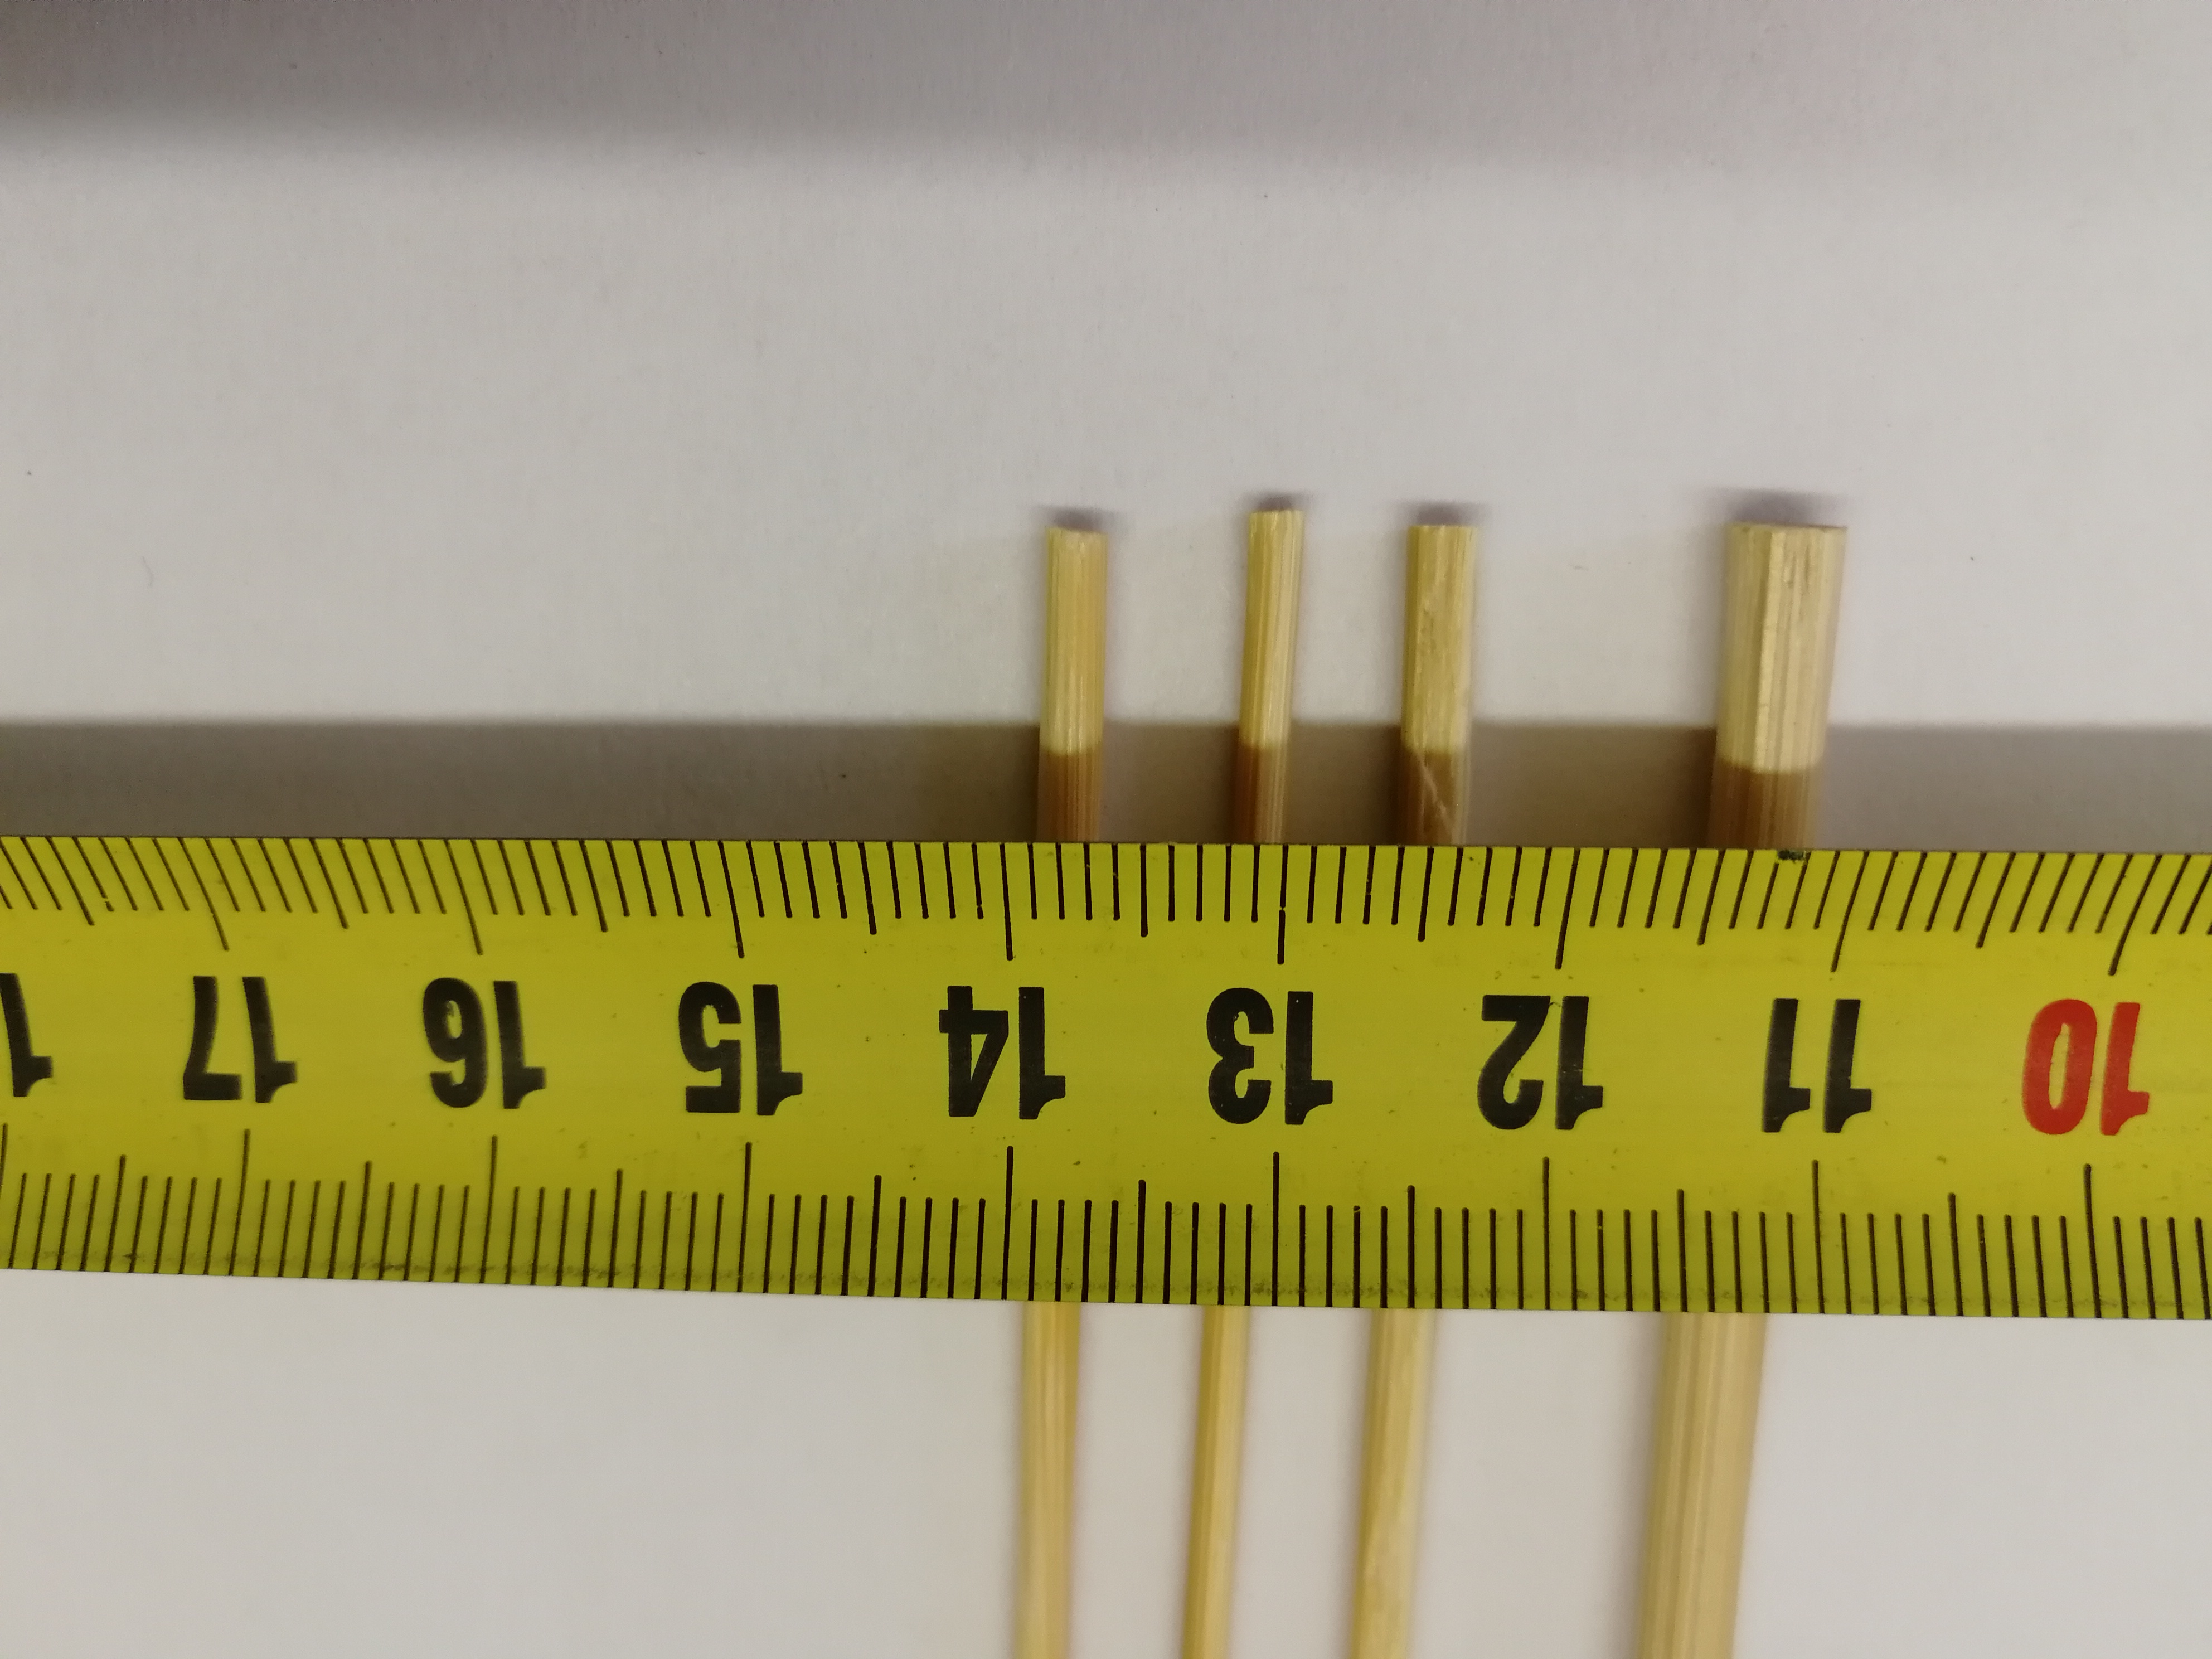 Шпажки для шашлыка разного диаметра